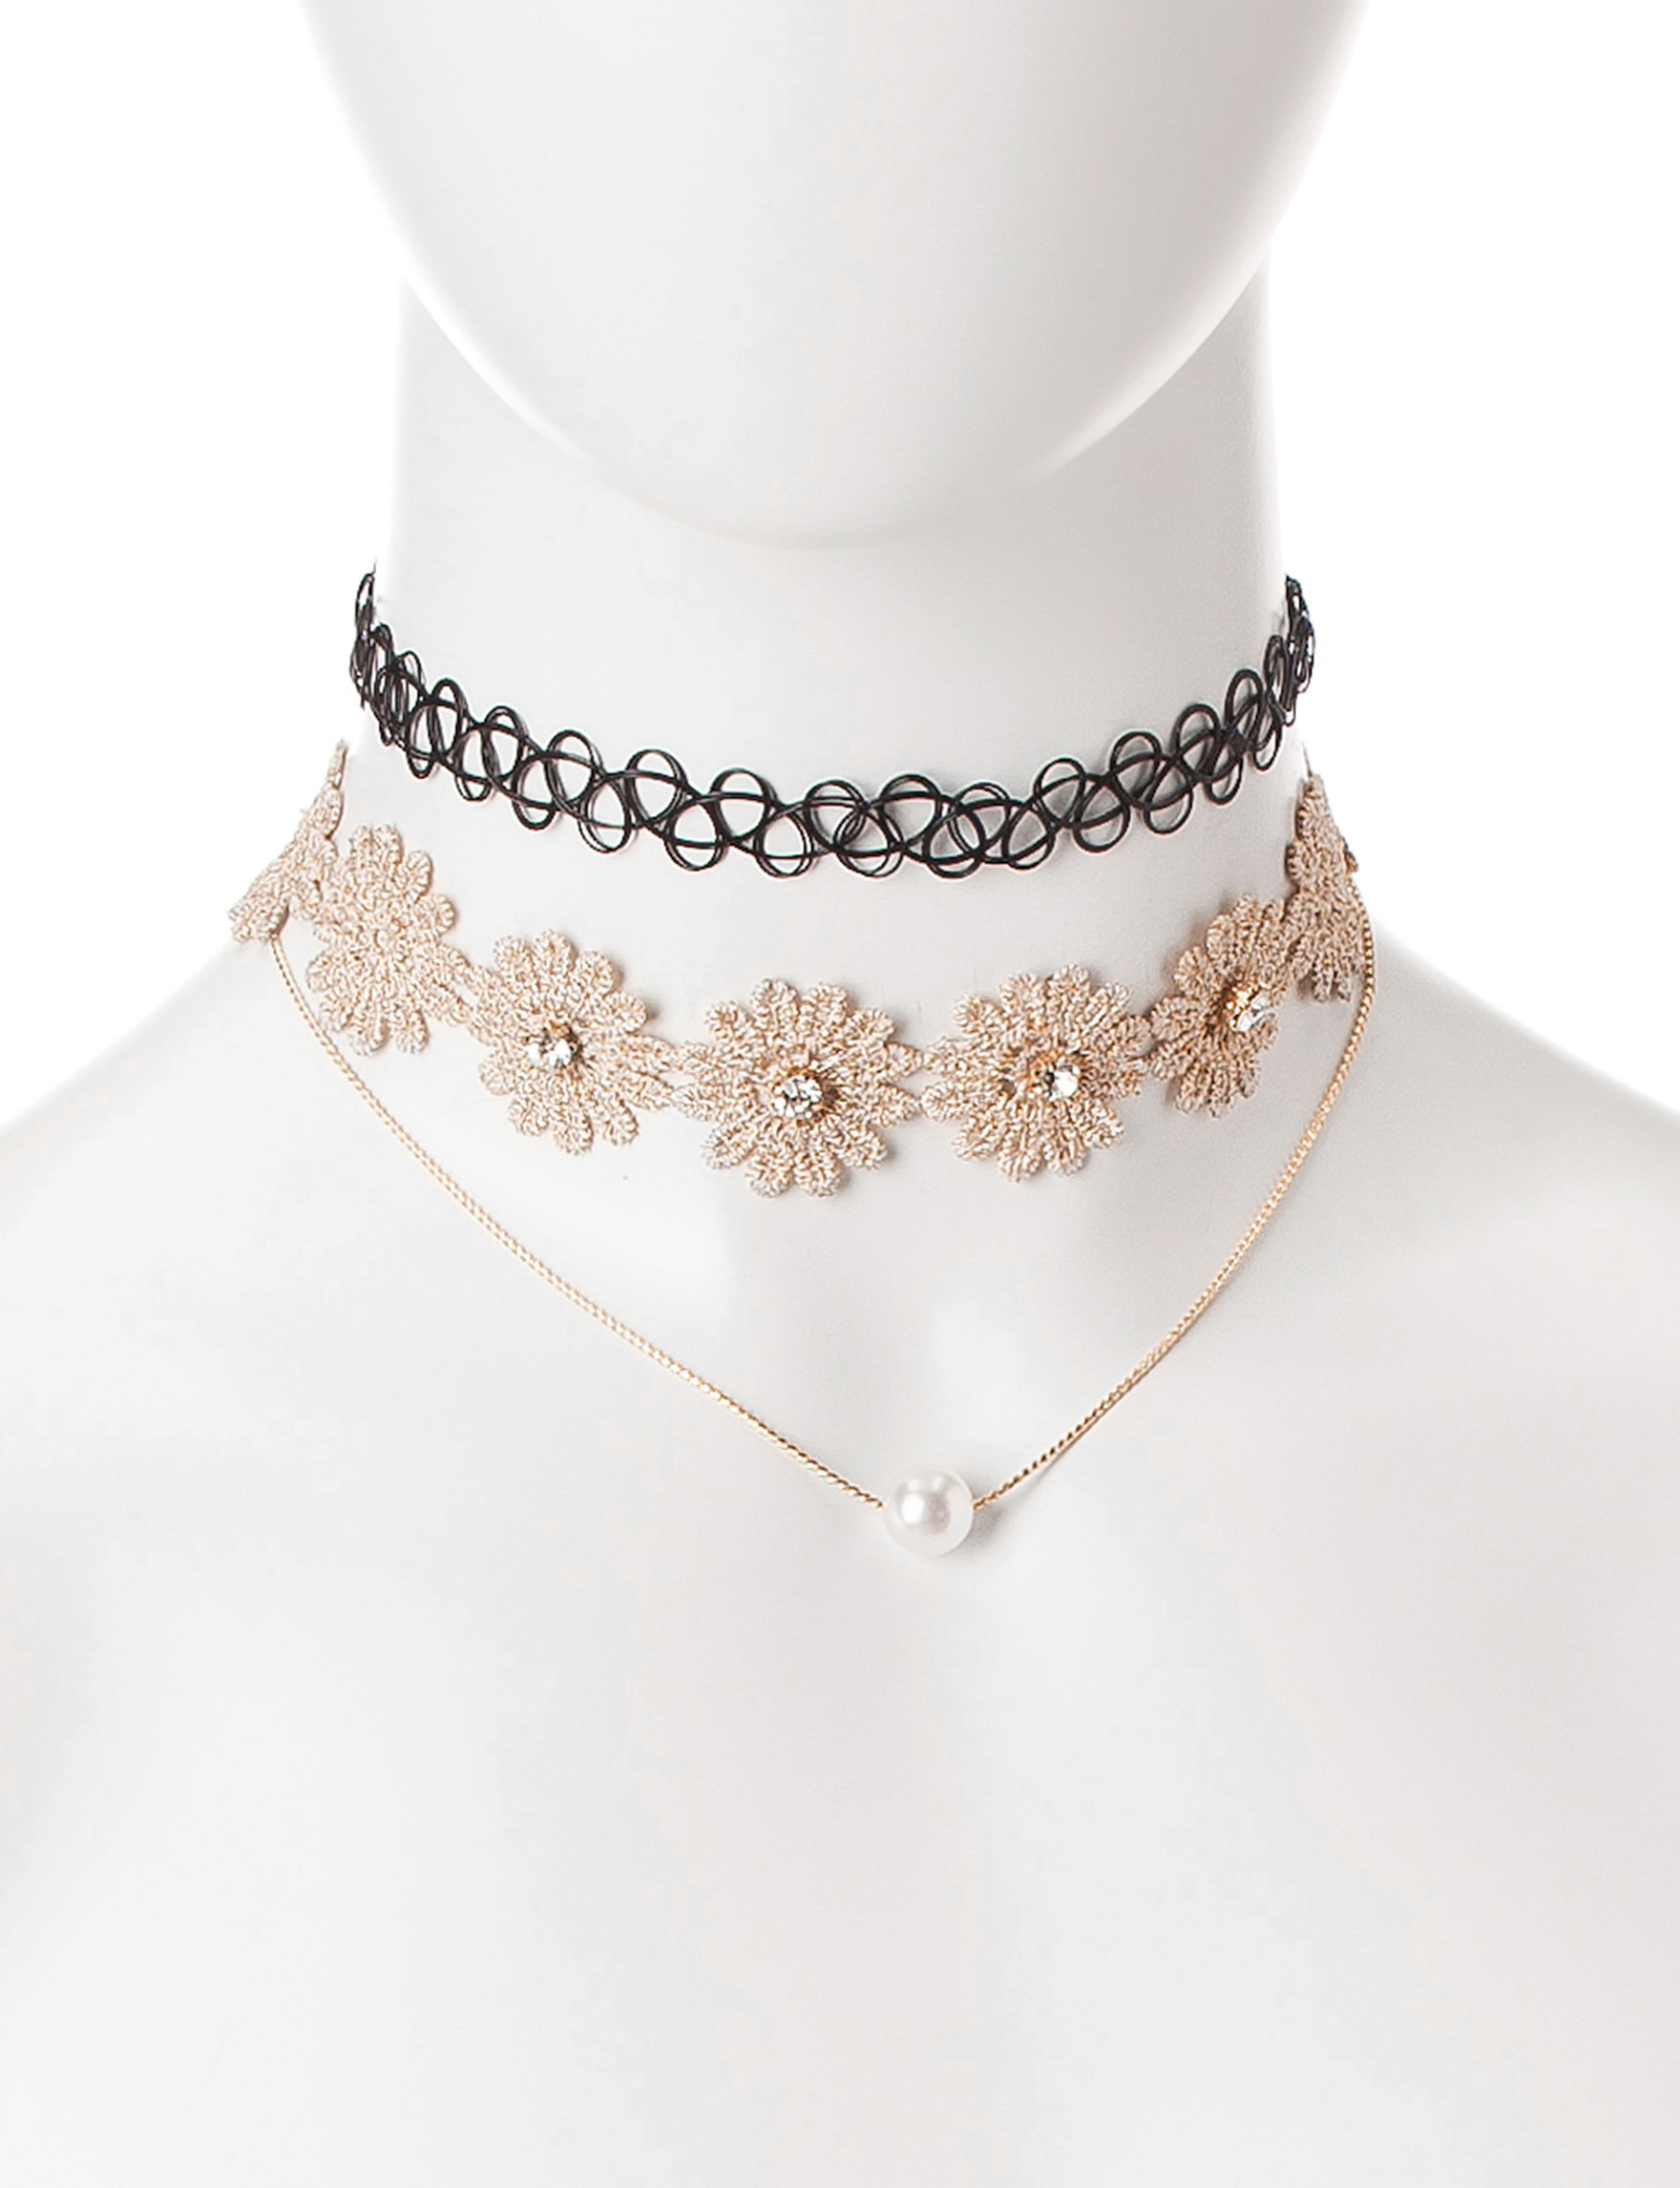 Hannah Beige / Multi Jewelry Sets Necklaces & Pendants Fashion Jewelry